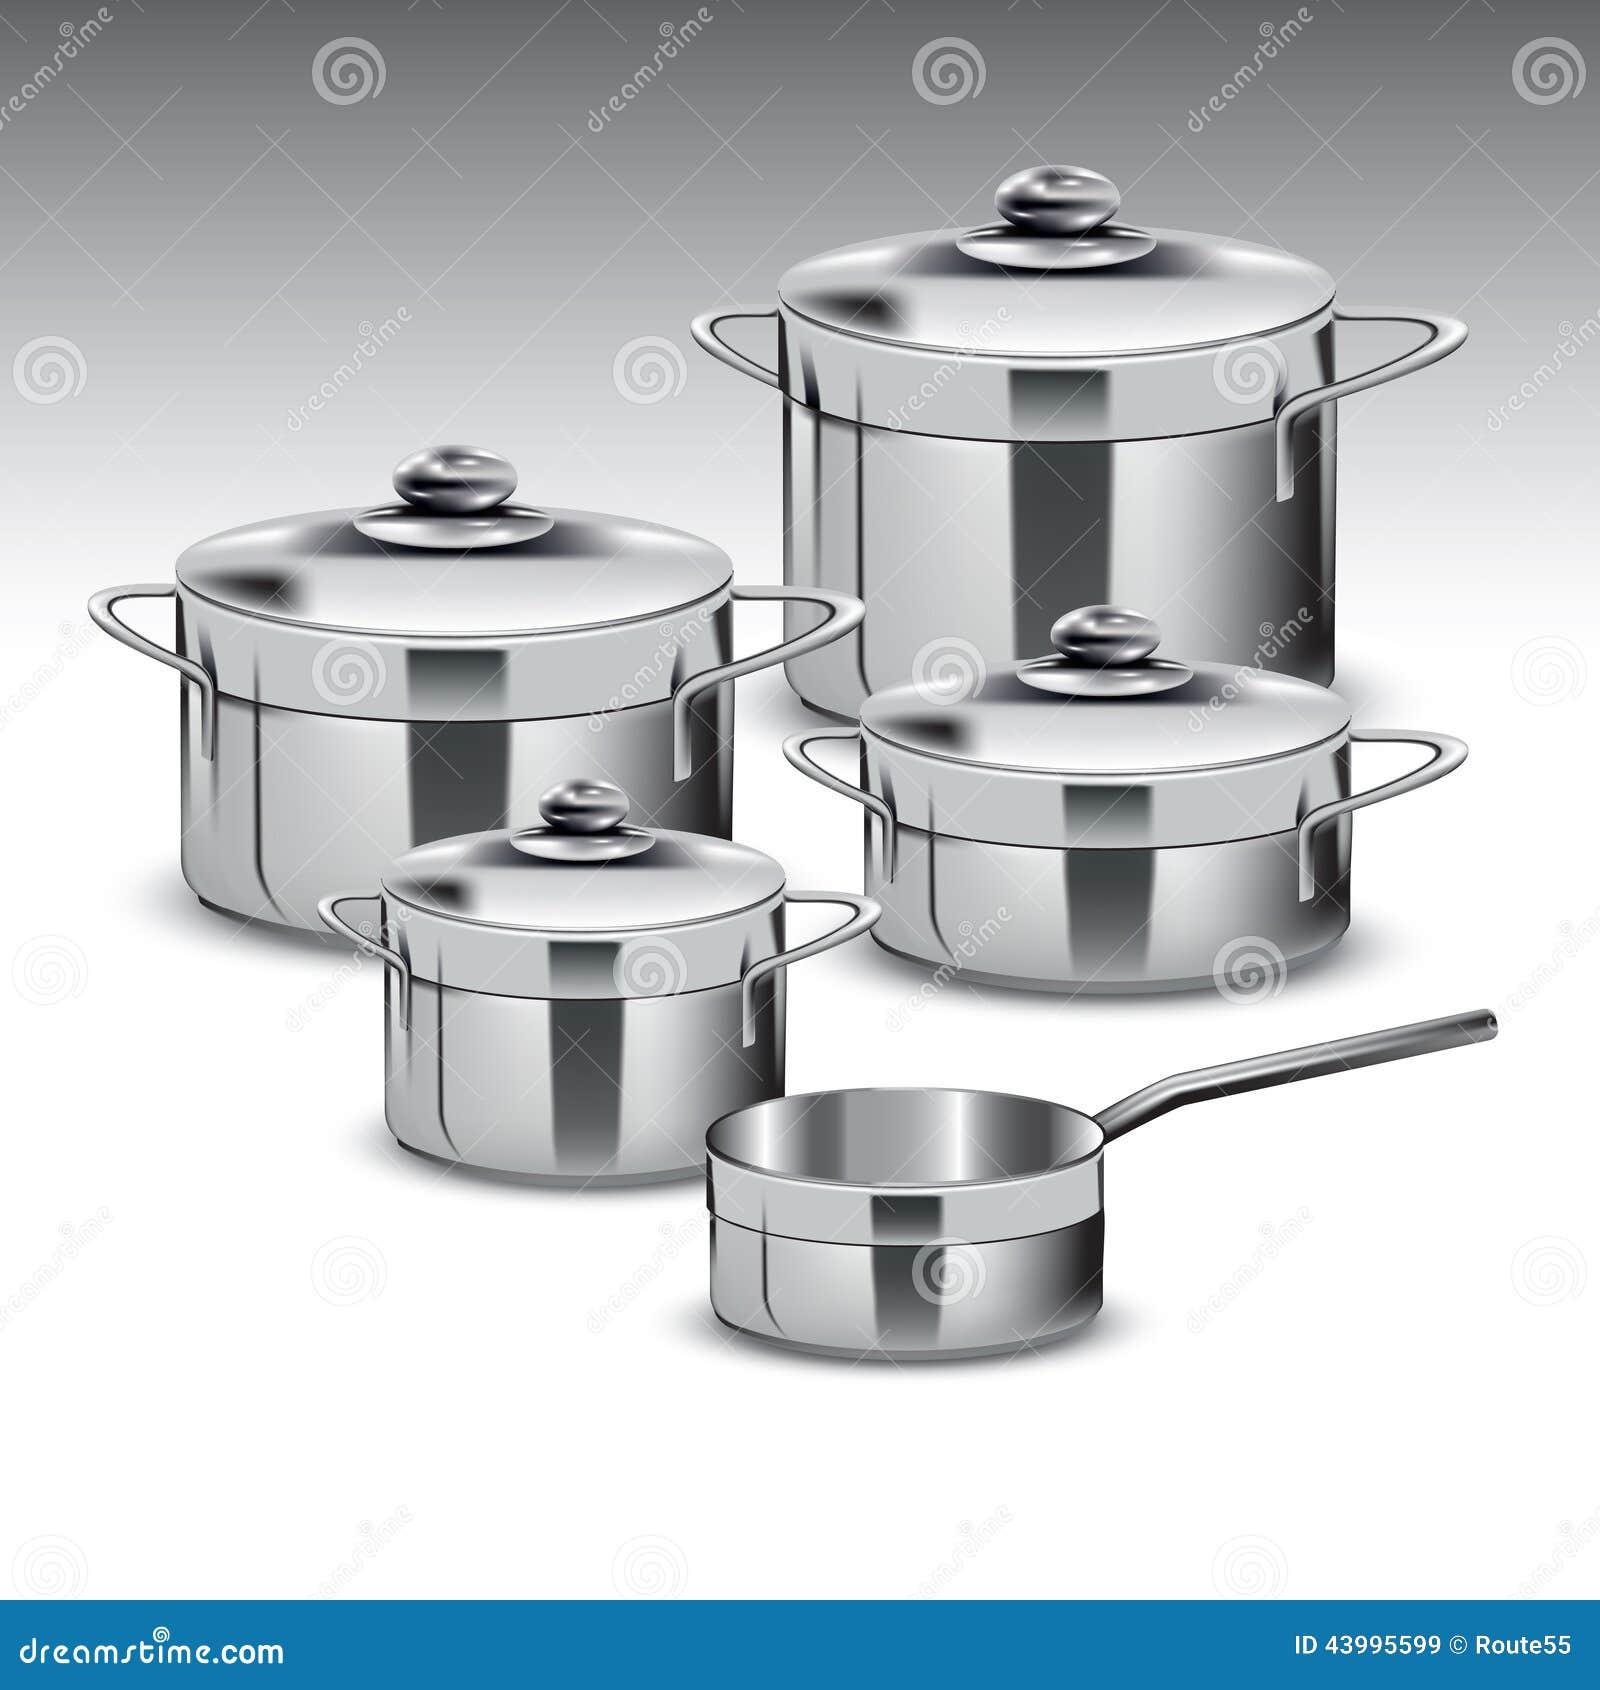 stainless steel pots stock vector image 43995599. Black Bedroom Furniture Sets. Home Design Ideas